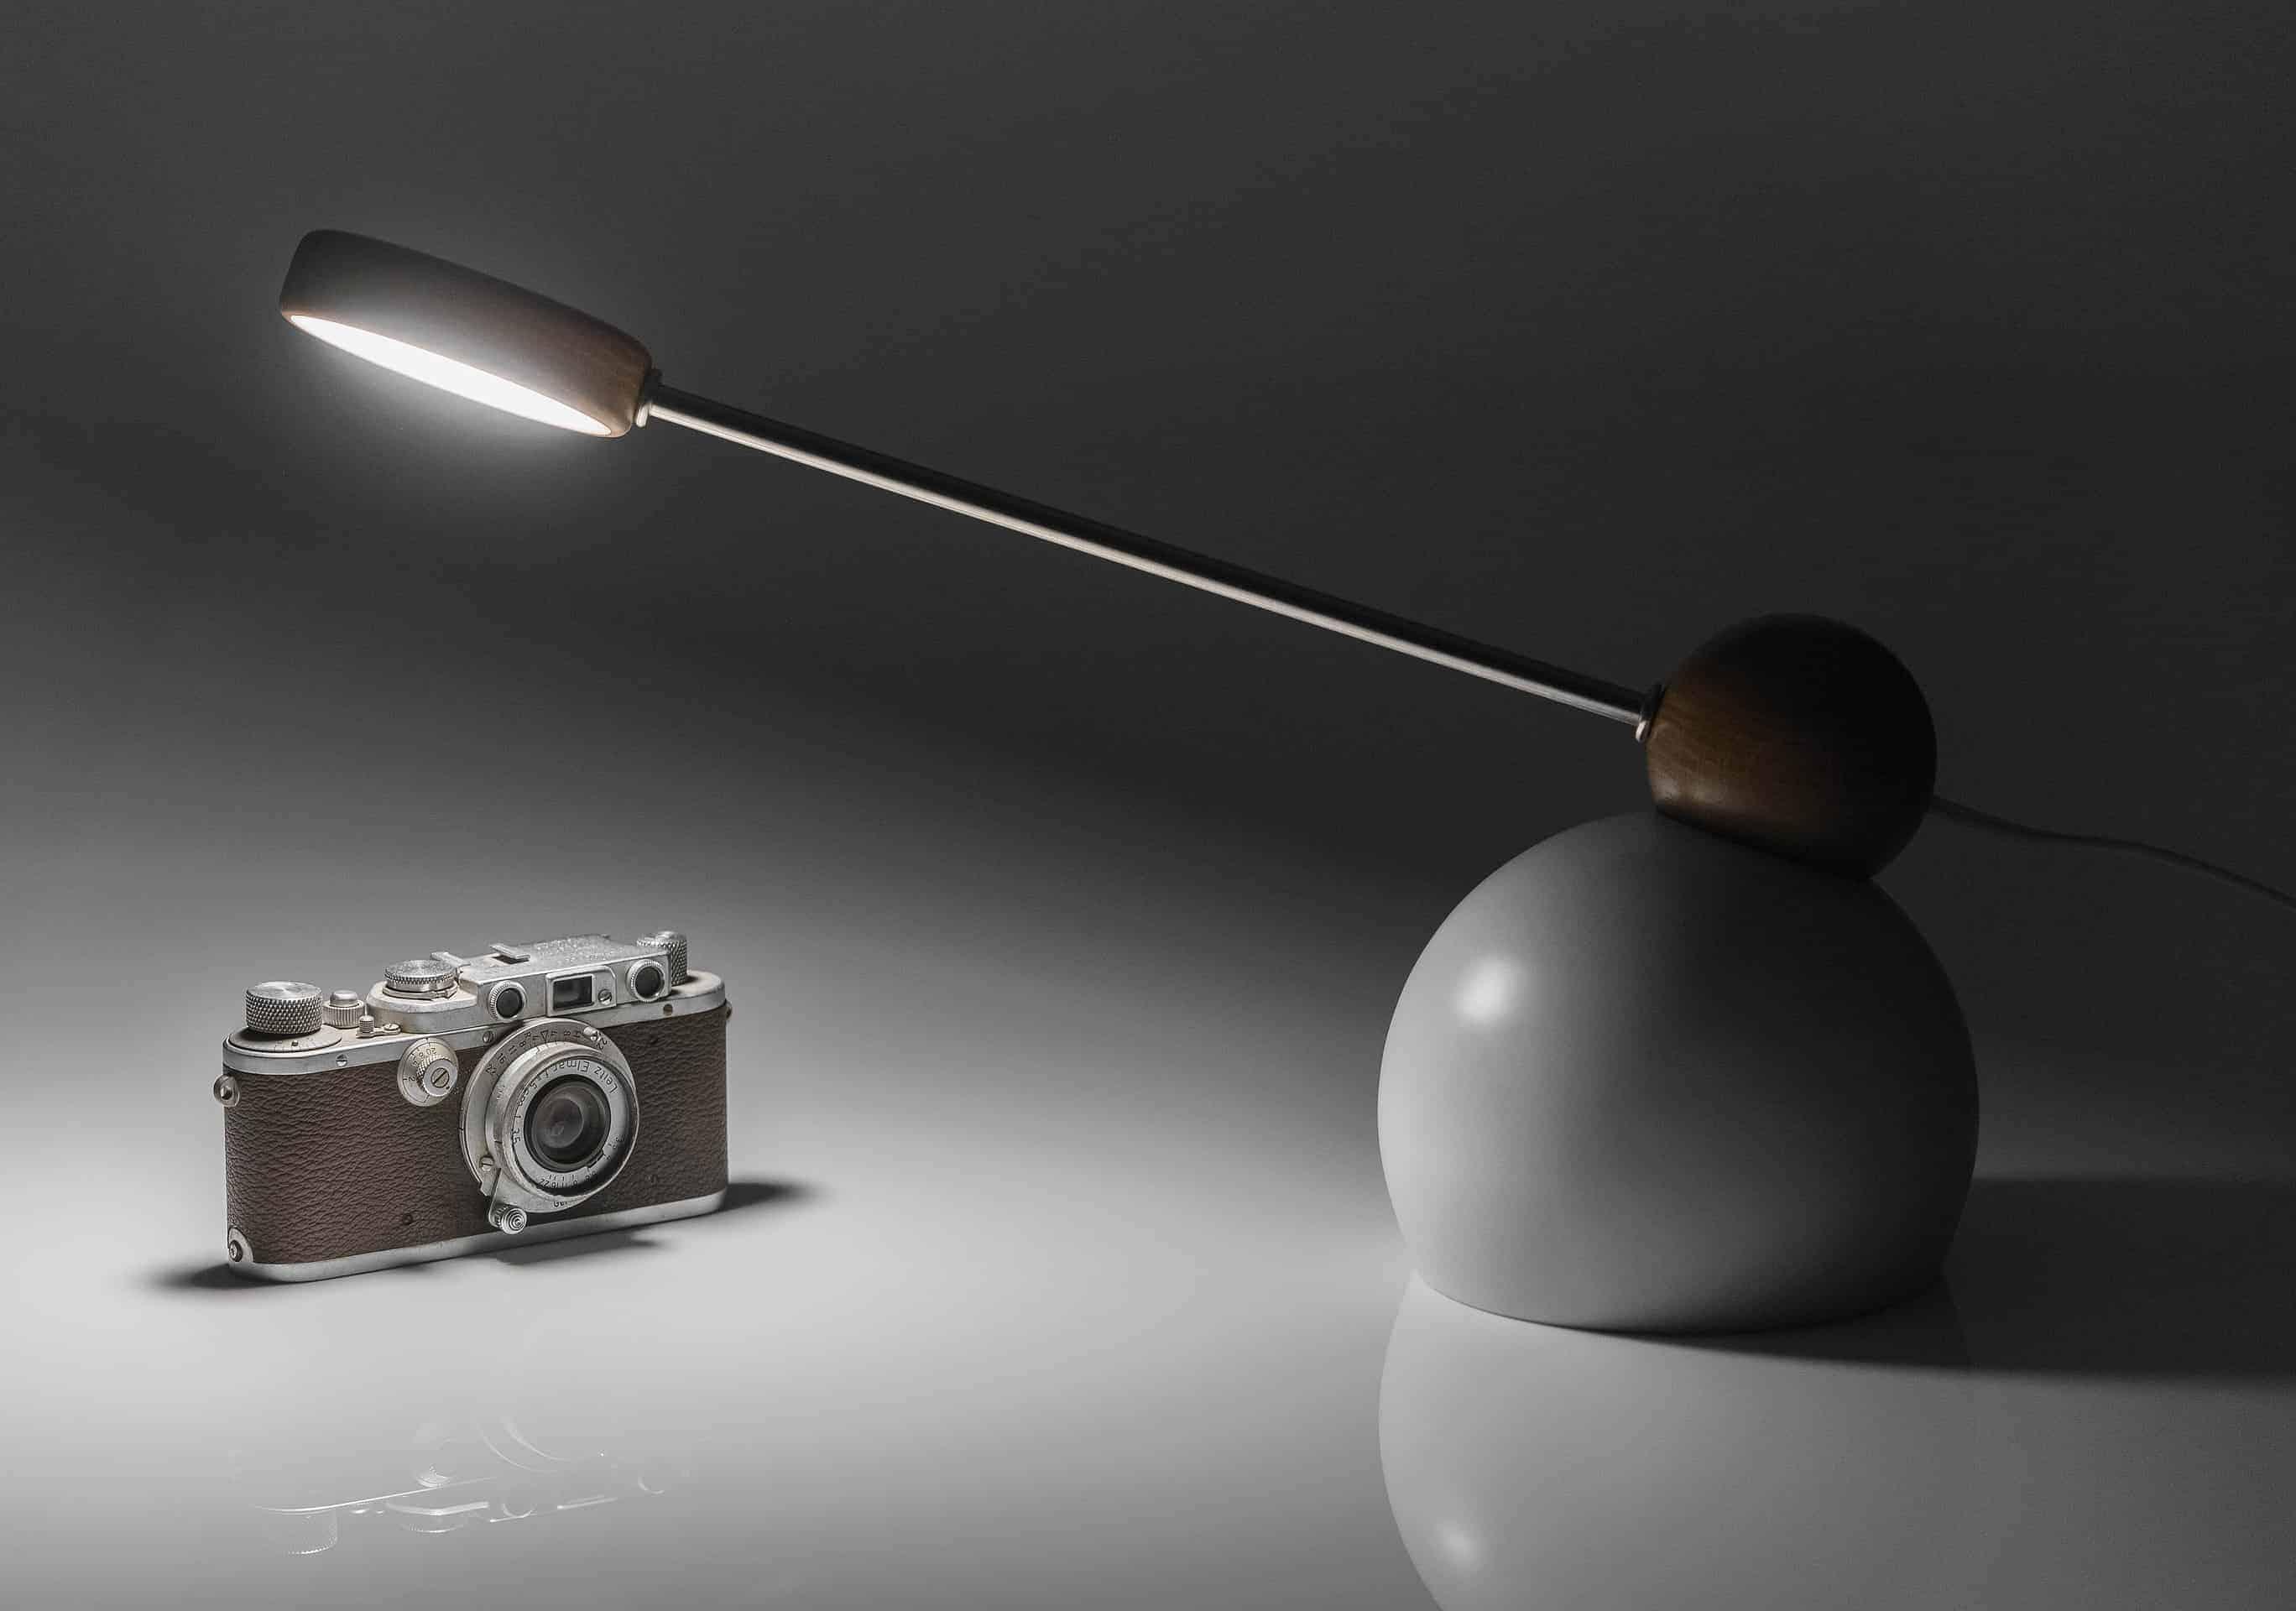 Magnetosphere Desk Lamp - Design Ideas for Desk Lamp Photography  131fsj